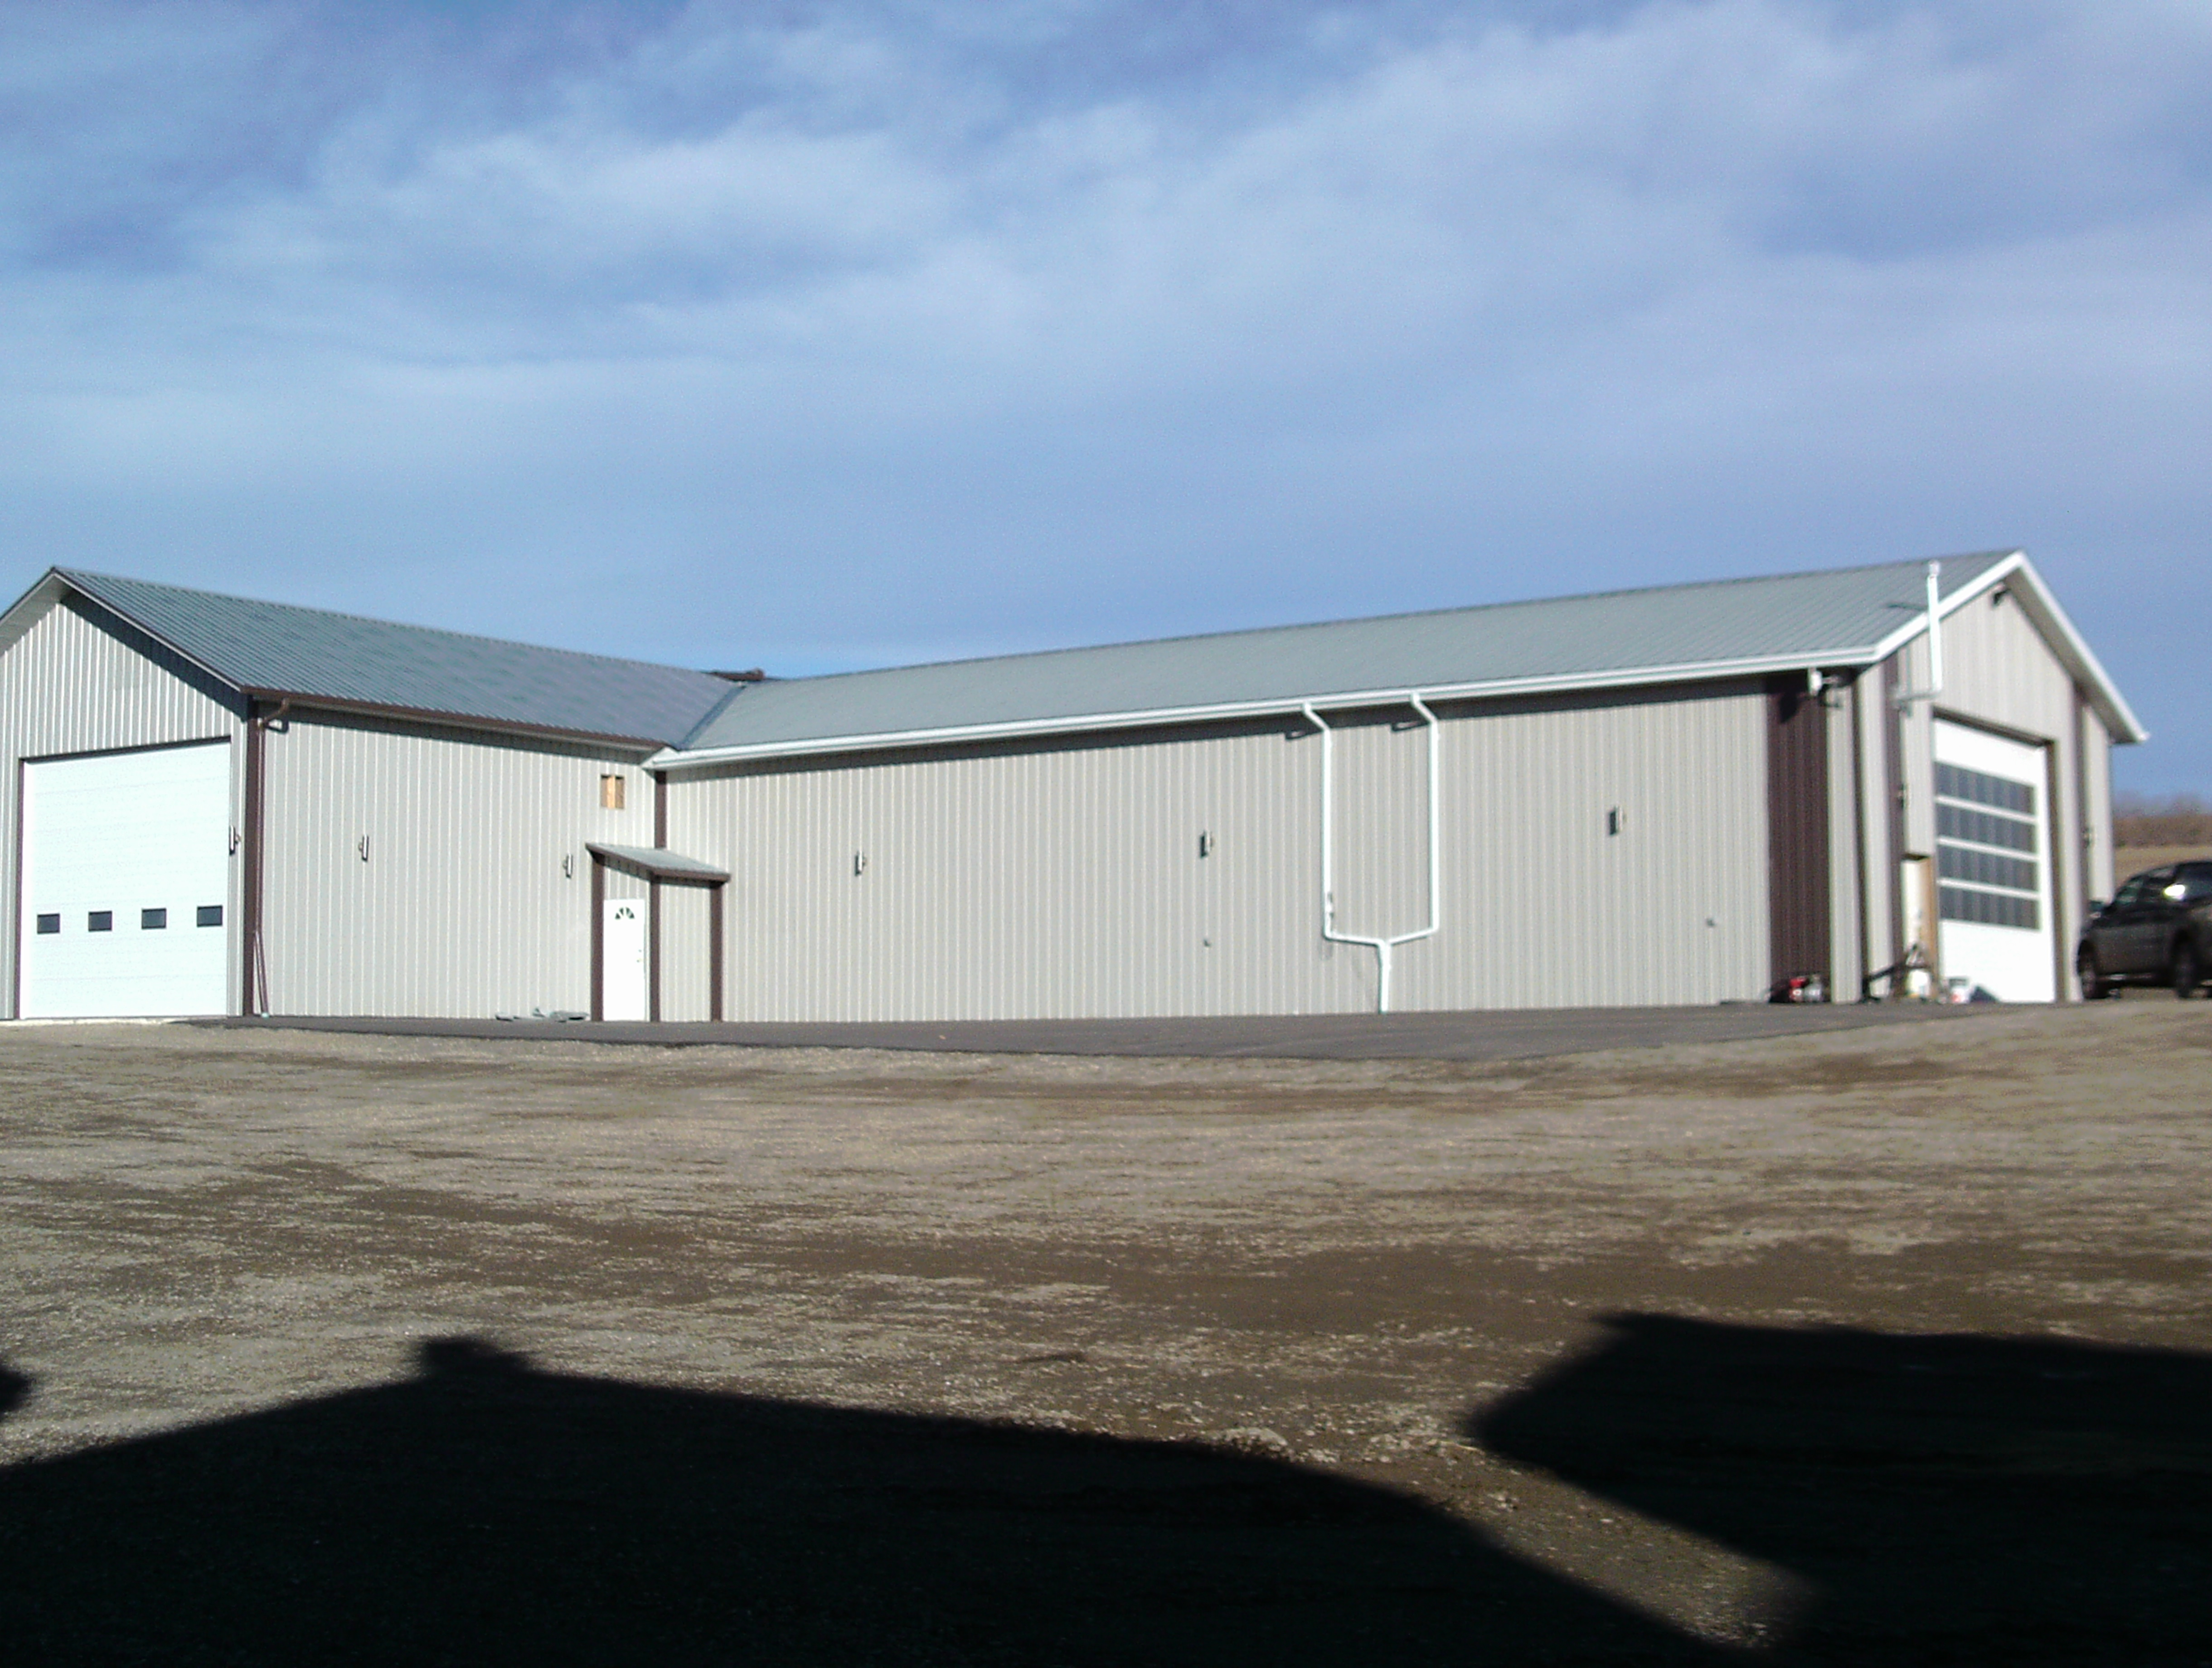 Fort St. John, B.C. - Maccabee Tanks, Corp